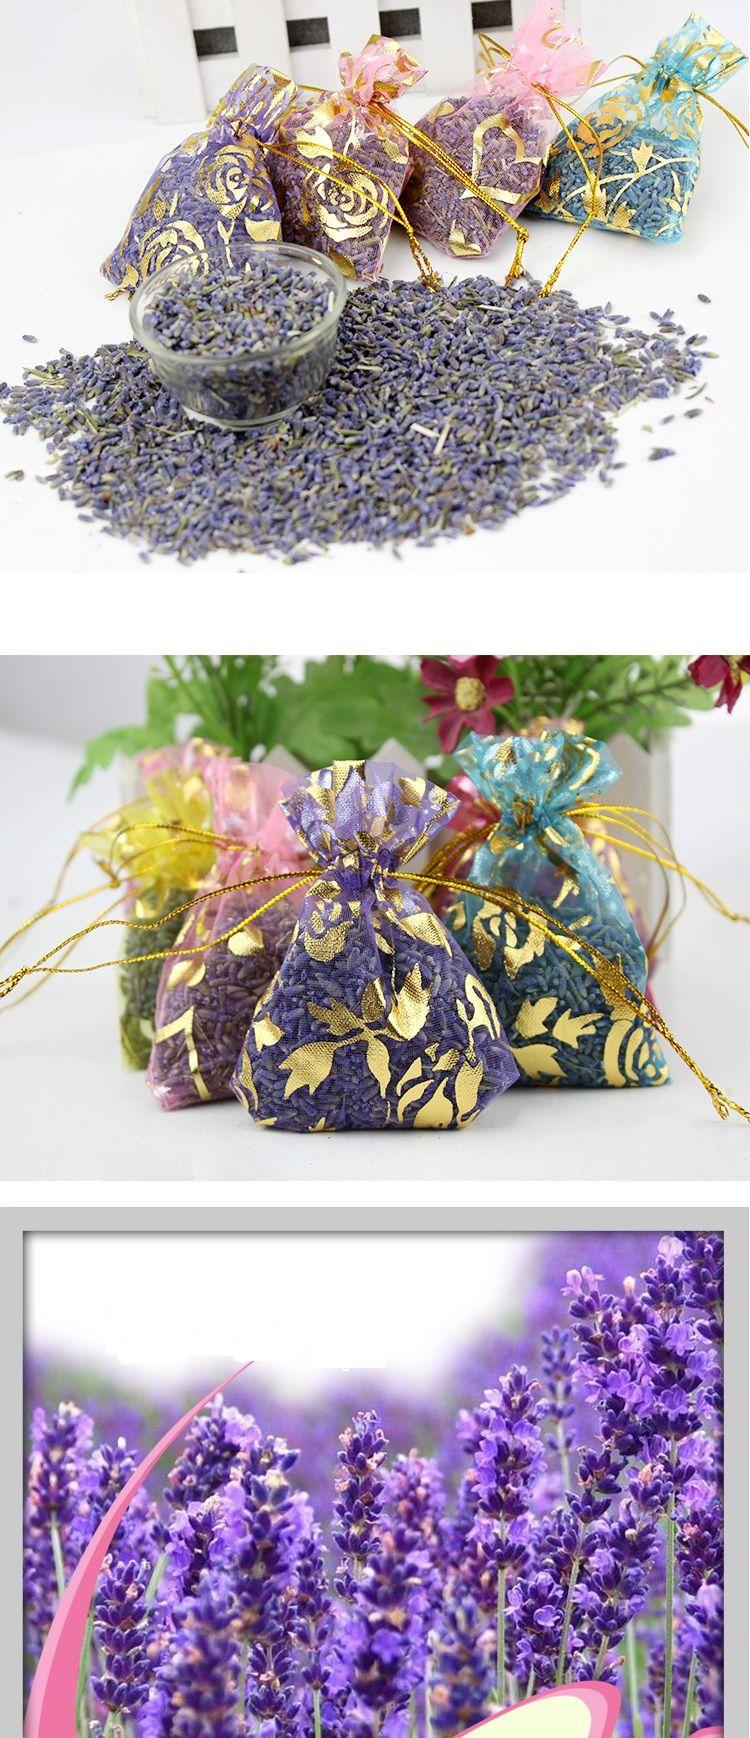 Natural Lavender Scented Fragrance Sachet Aromatherapy Automobile, Closets And Dresser Car Bedroom Air Freshener Sachet Sachets Present